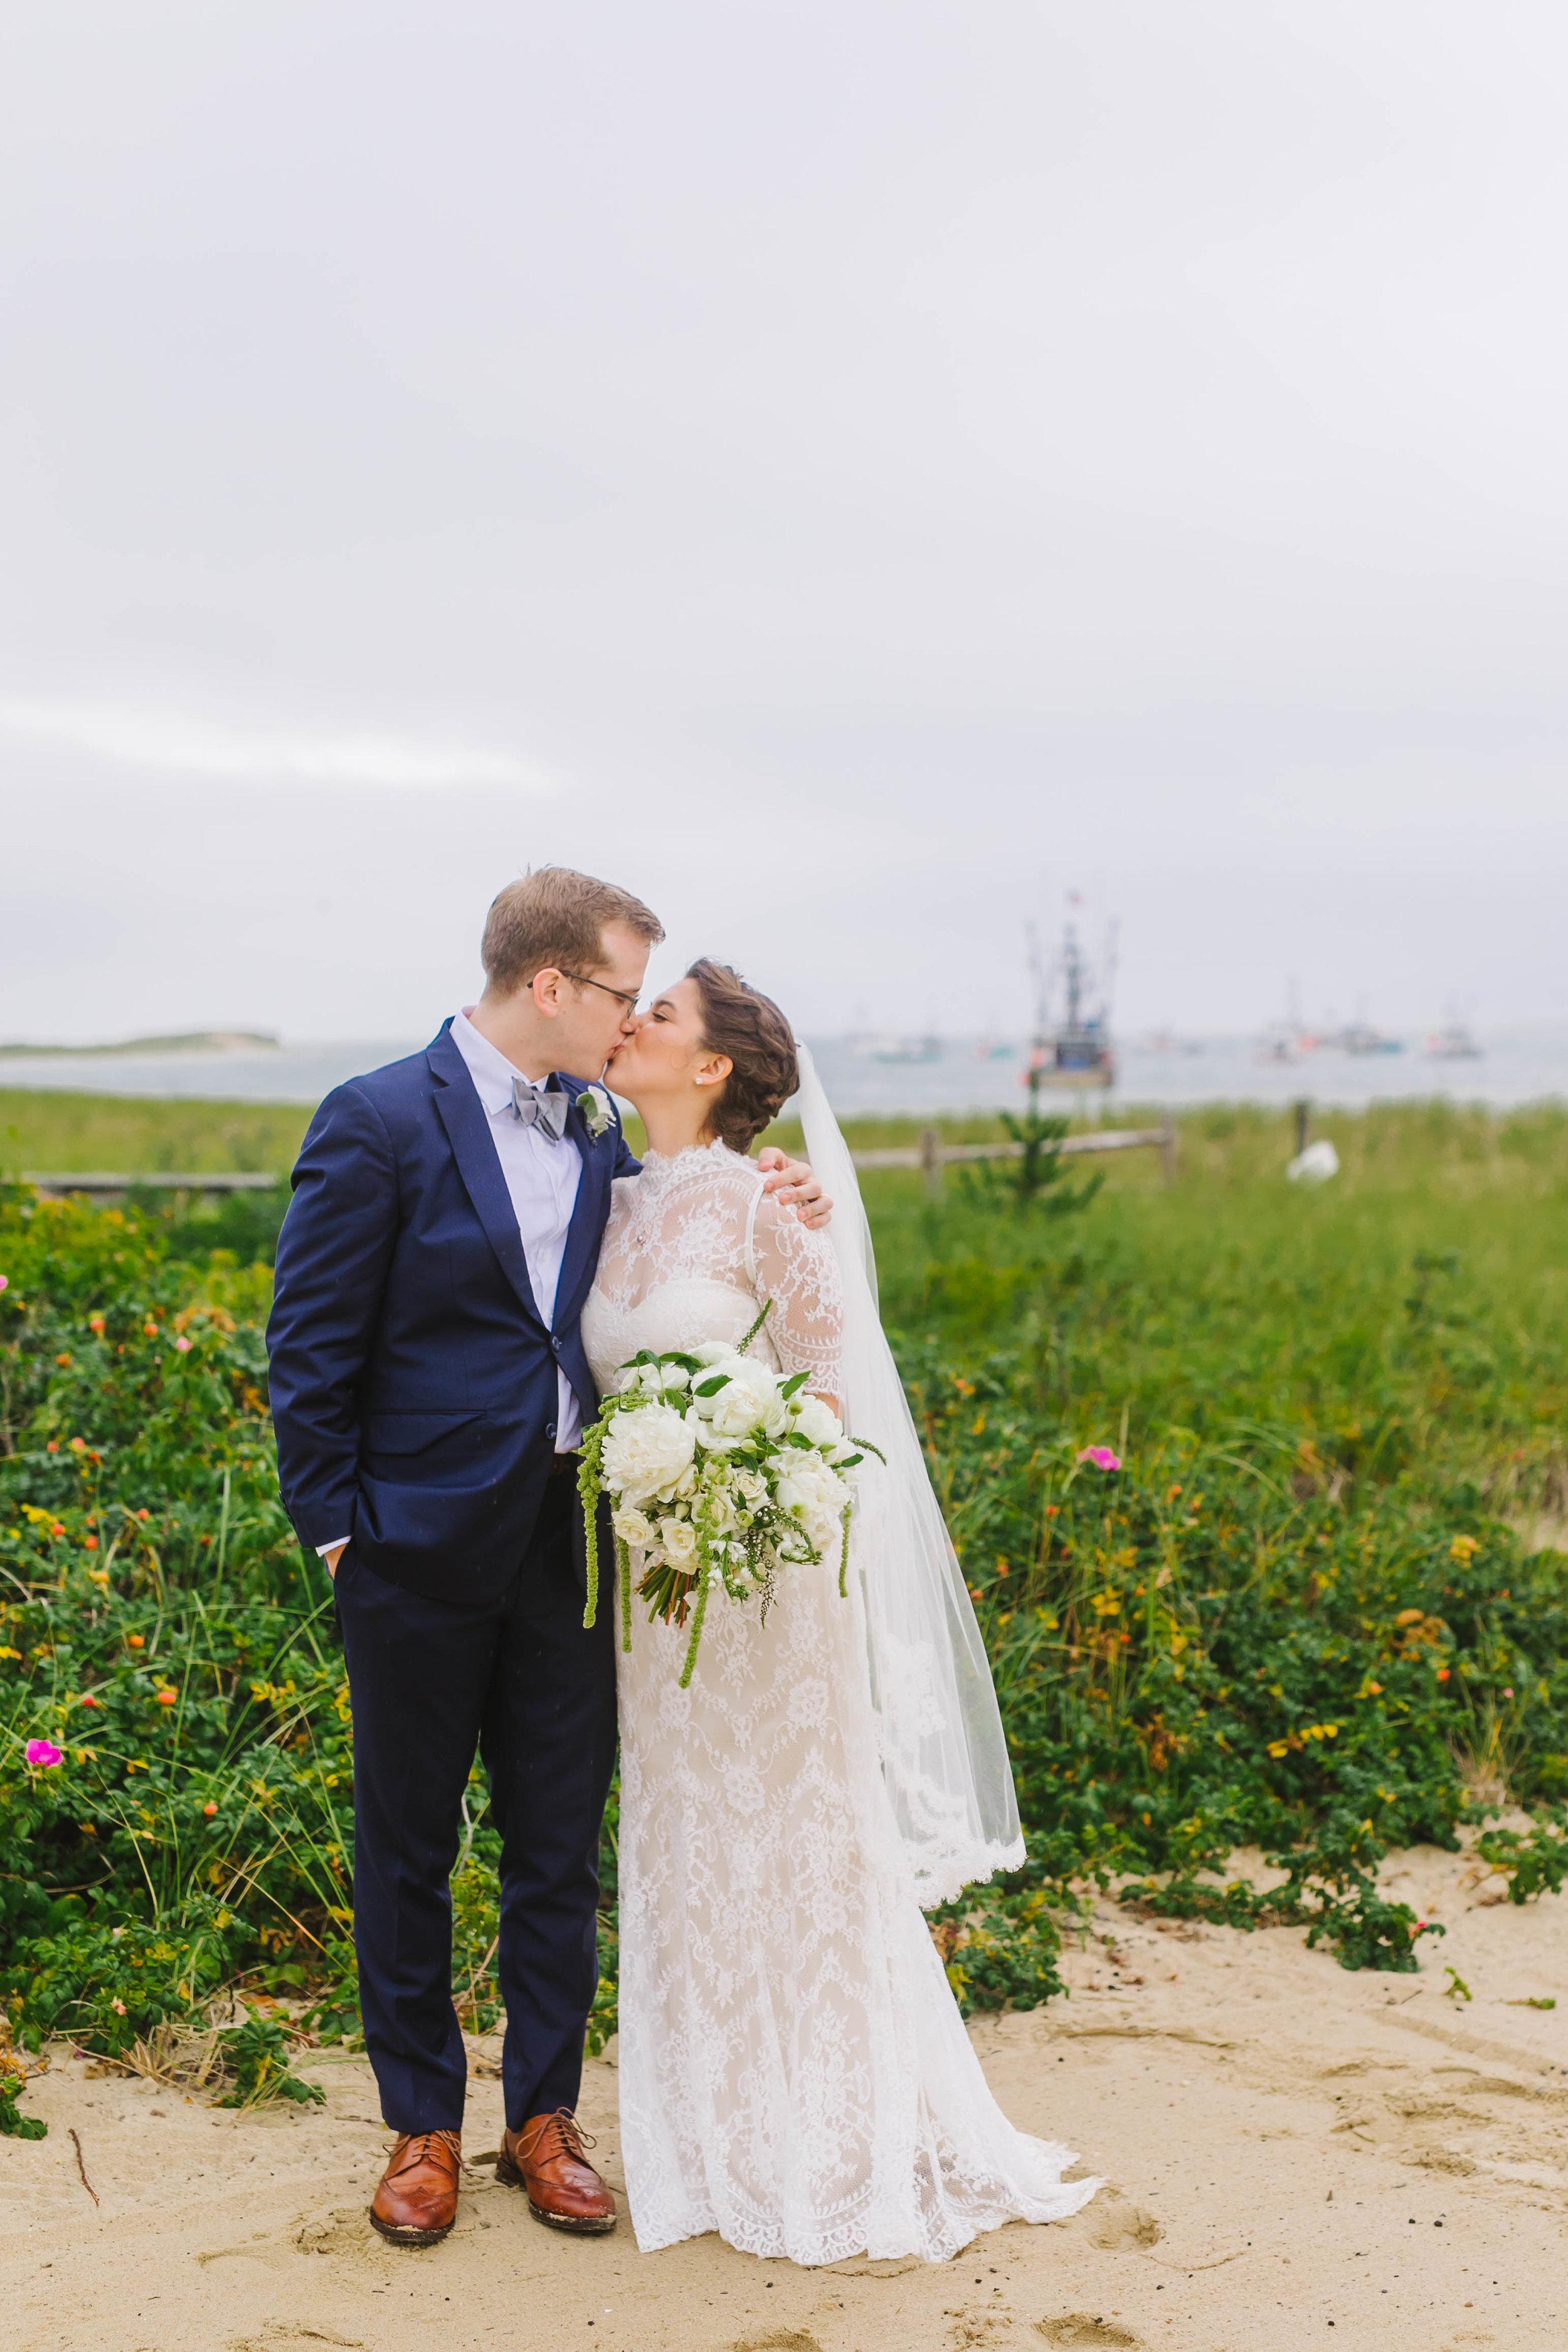 Chatham Bars Inn Cape Cod MA Rain Rainy Wedding with Dog - Emily Tebbetts Photography-9.jpg